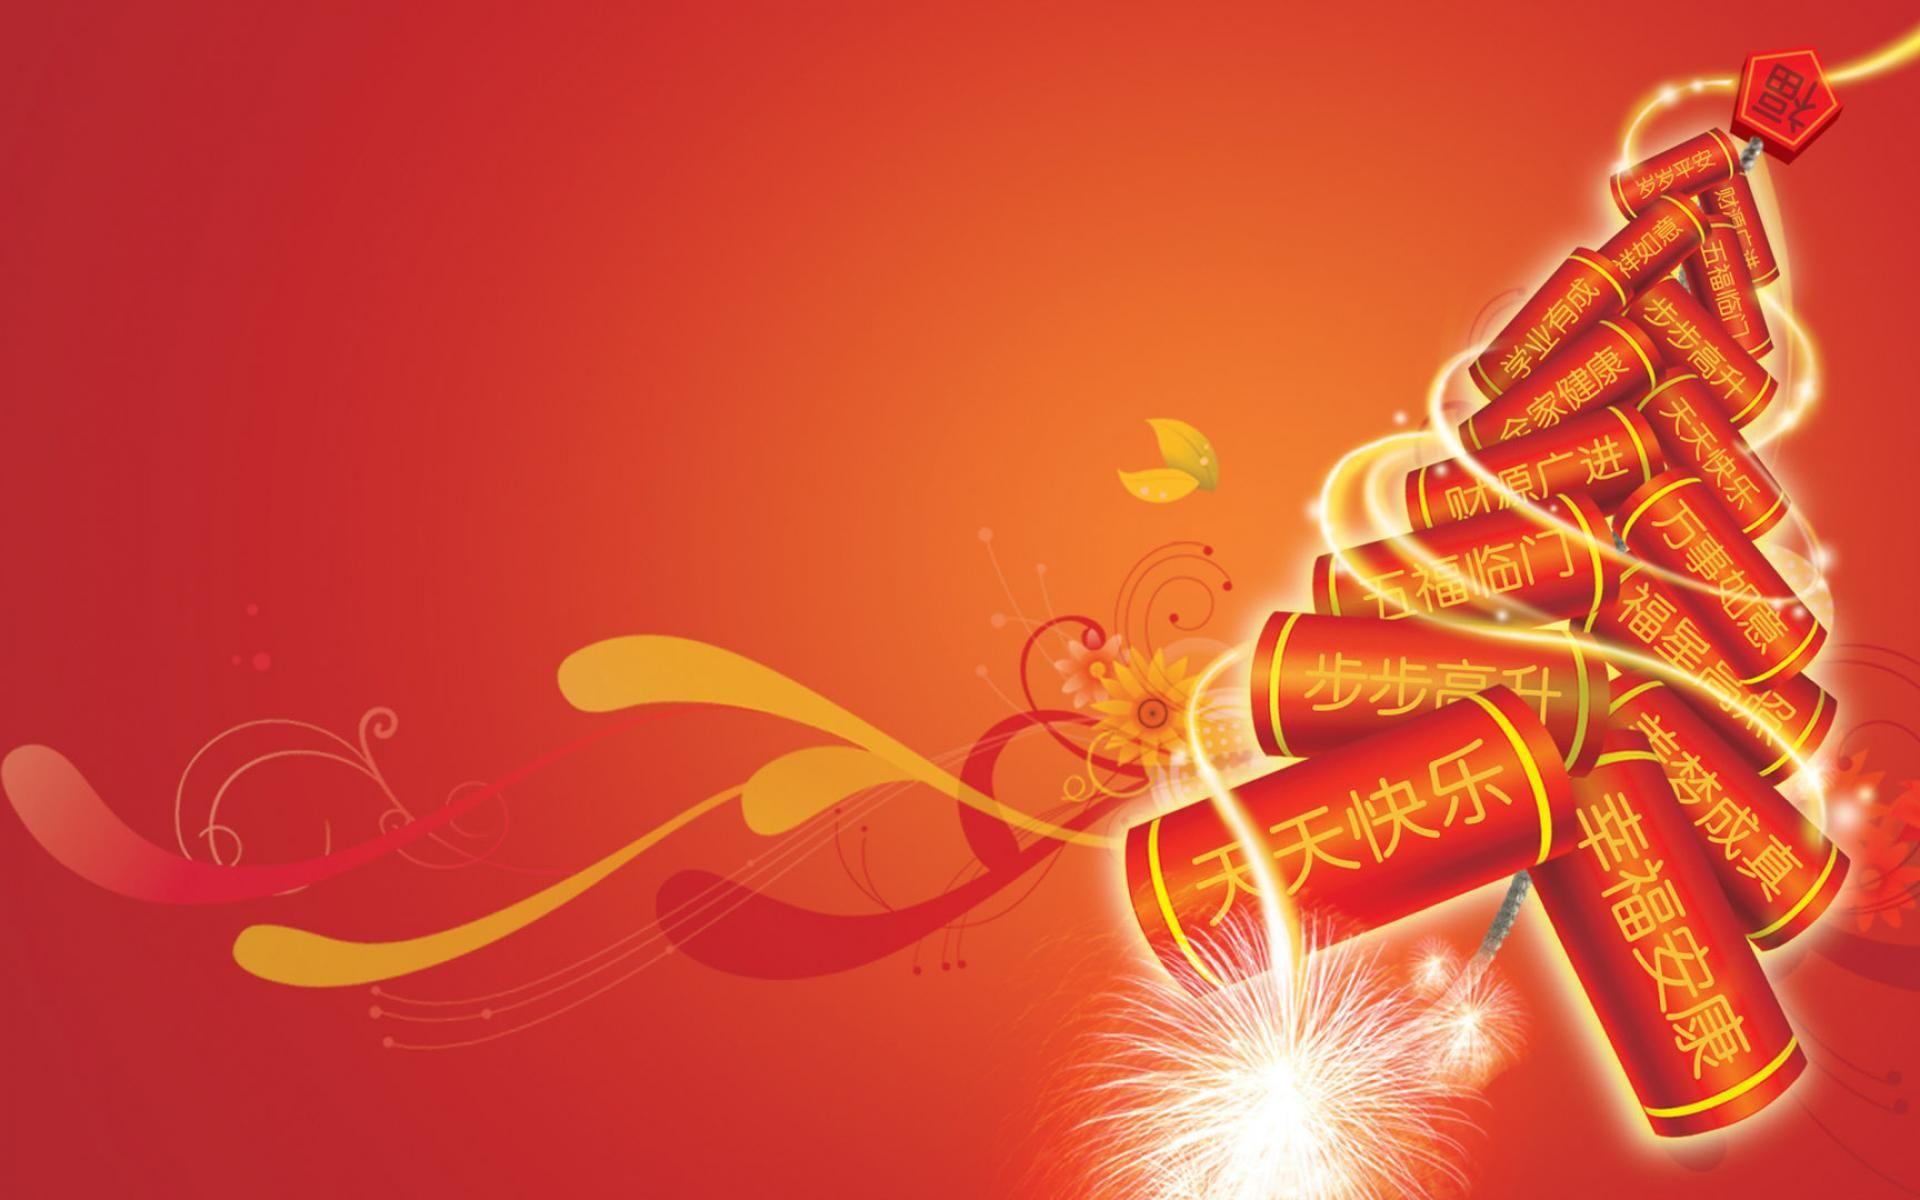 chinese new year wallpaper desktop wallpapers 2015   Grasscloth 1920x1200